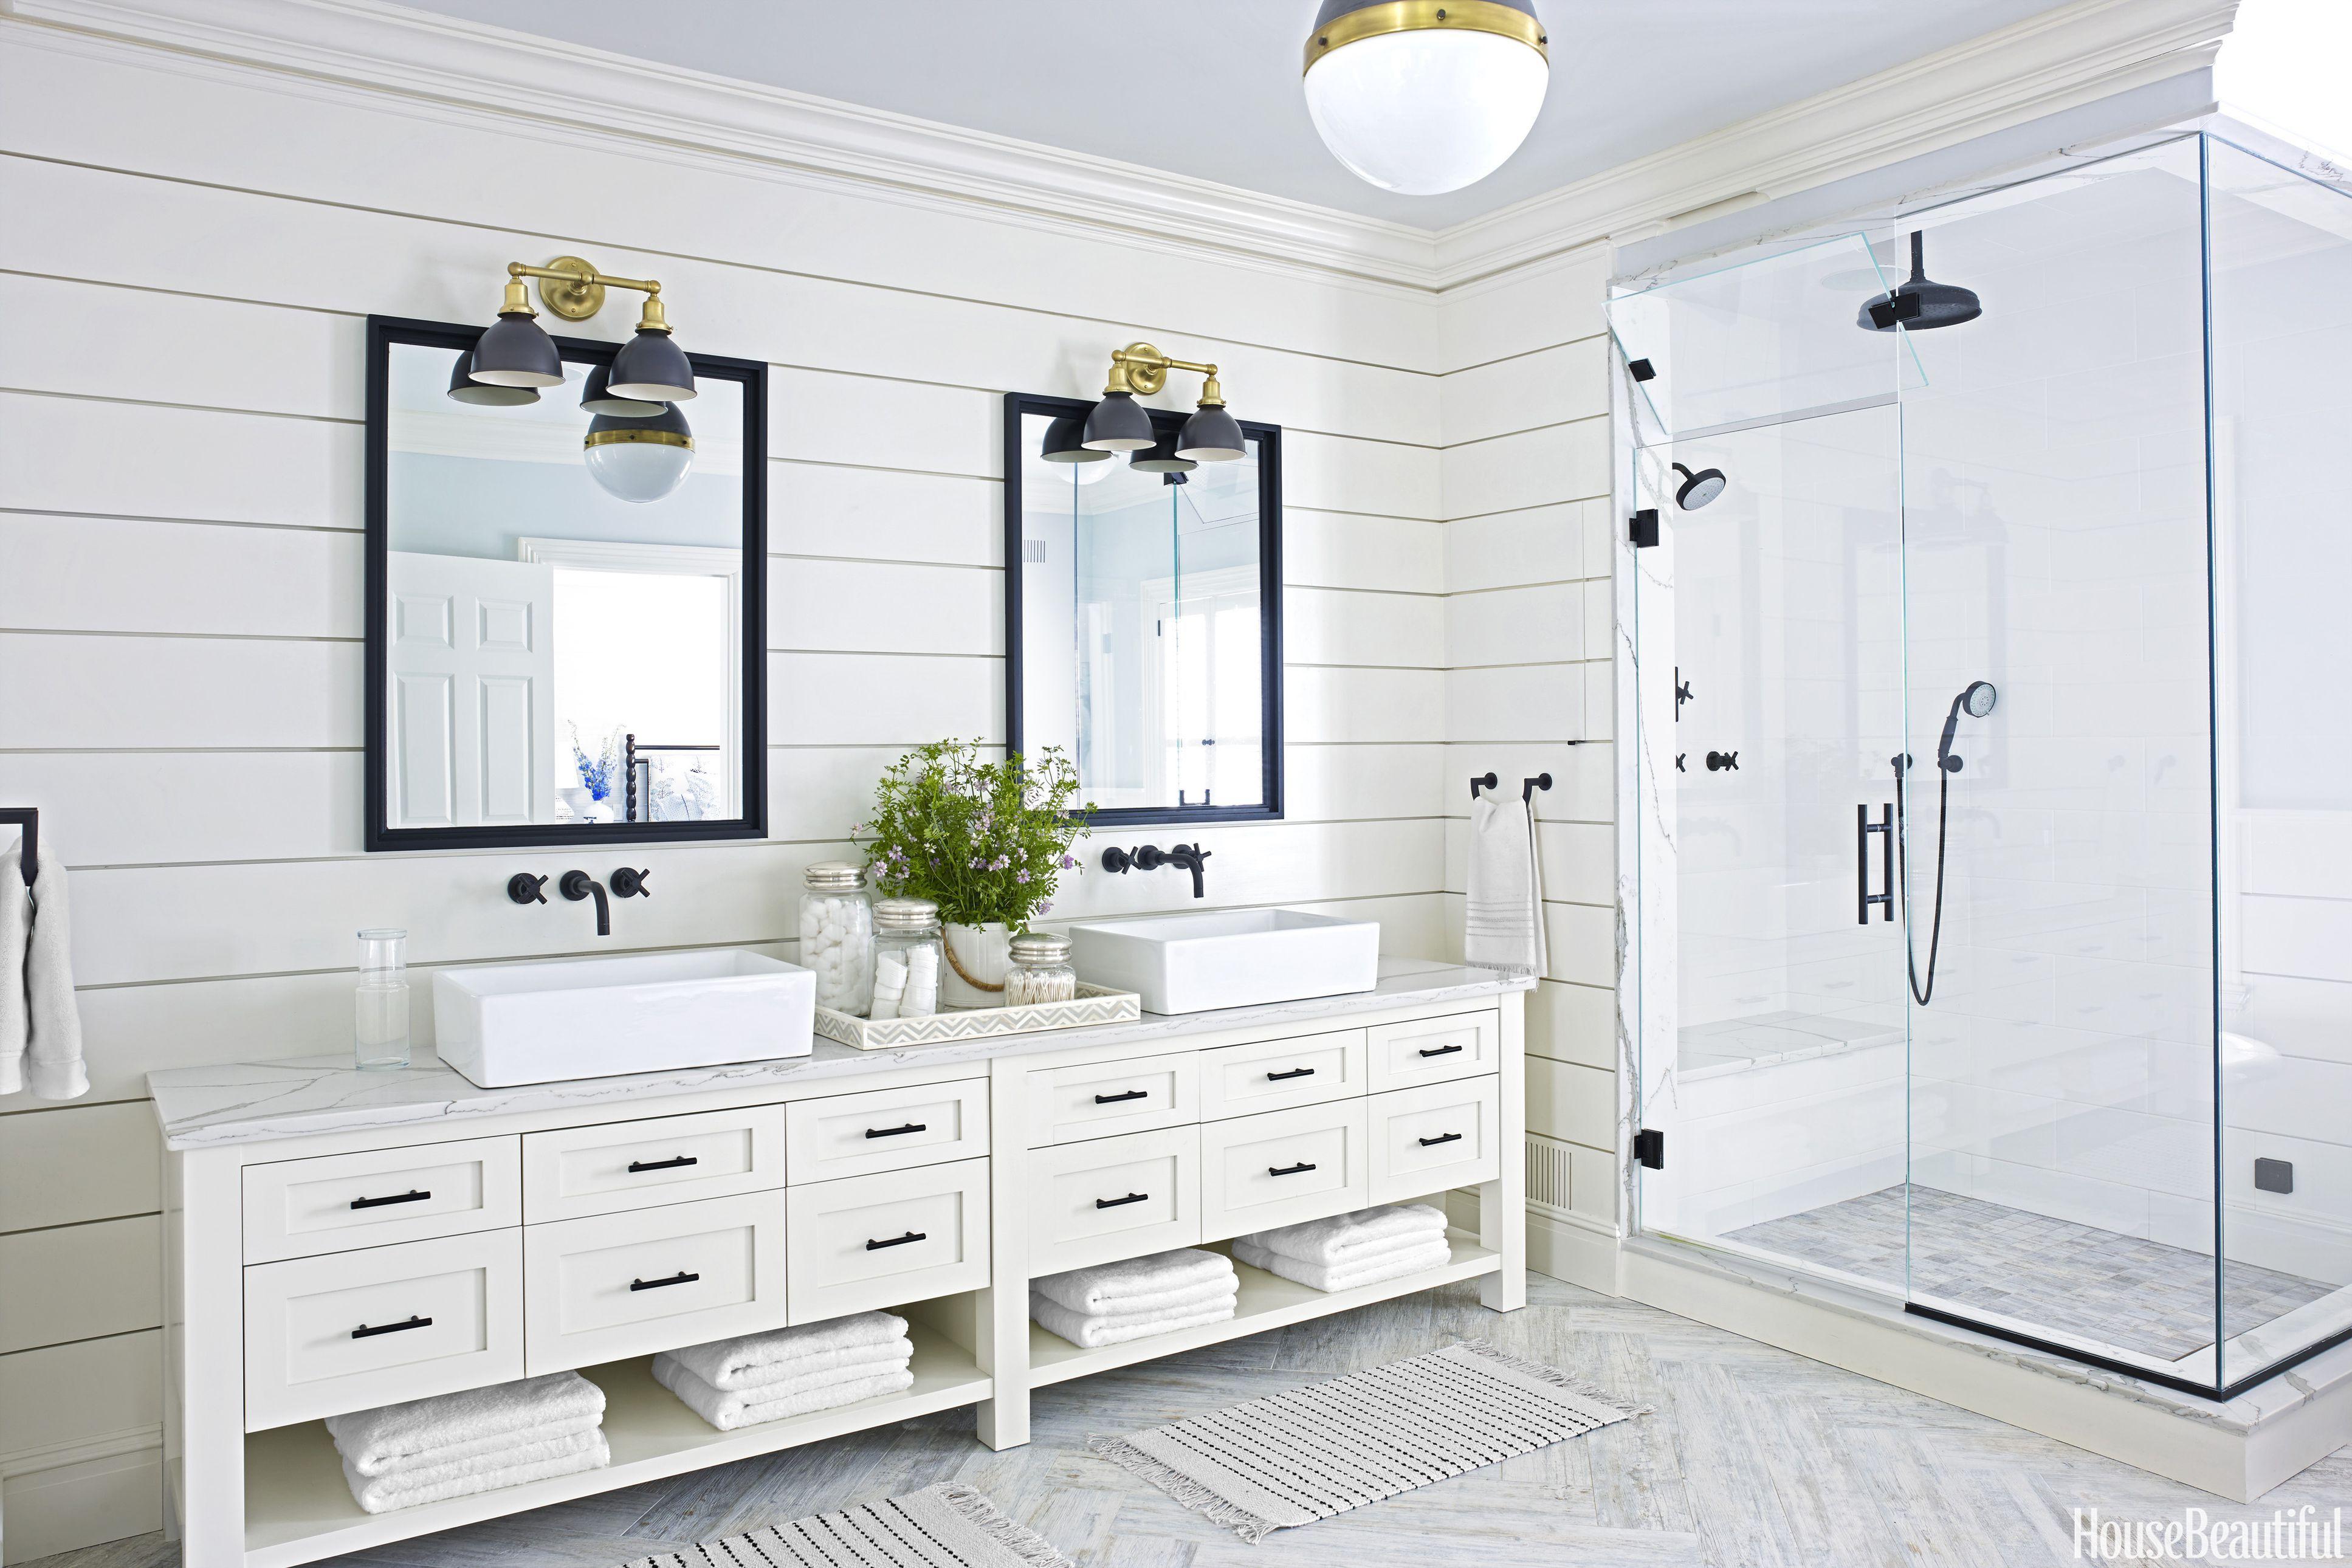 15 black and white bathroom ideas black white tile designs we love rh housebeautiful com white bathroom designs 2018 white bathroom design images